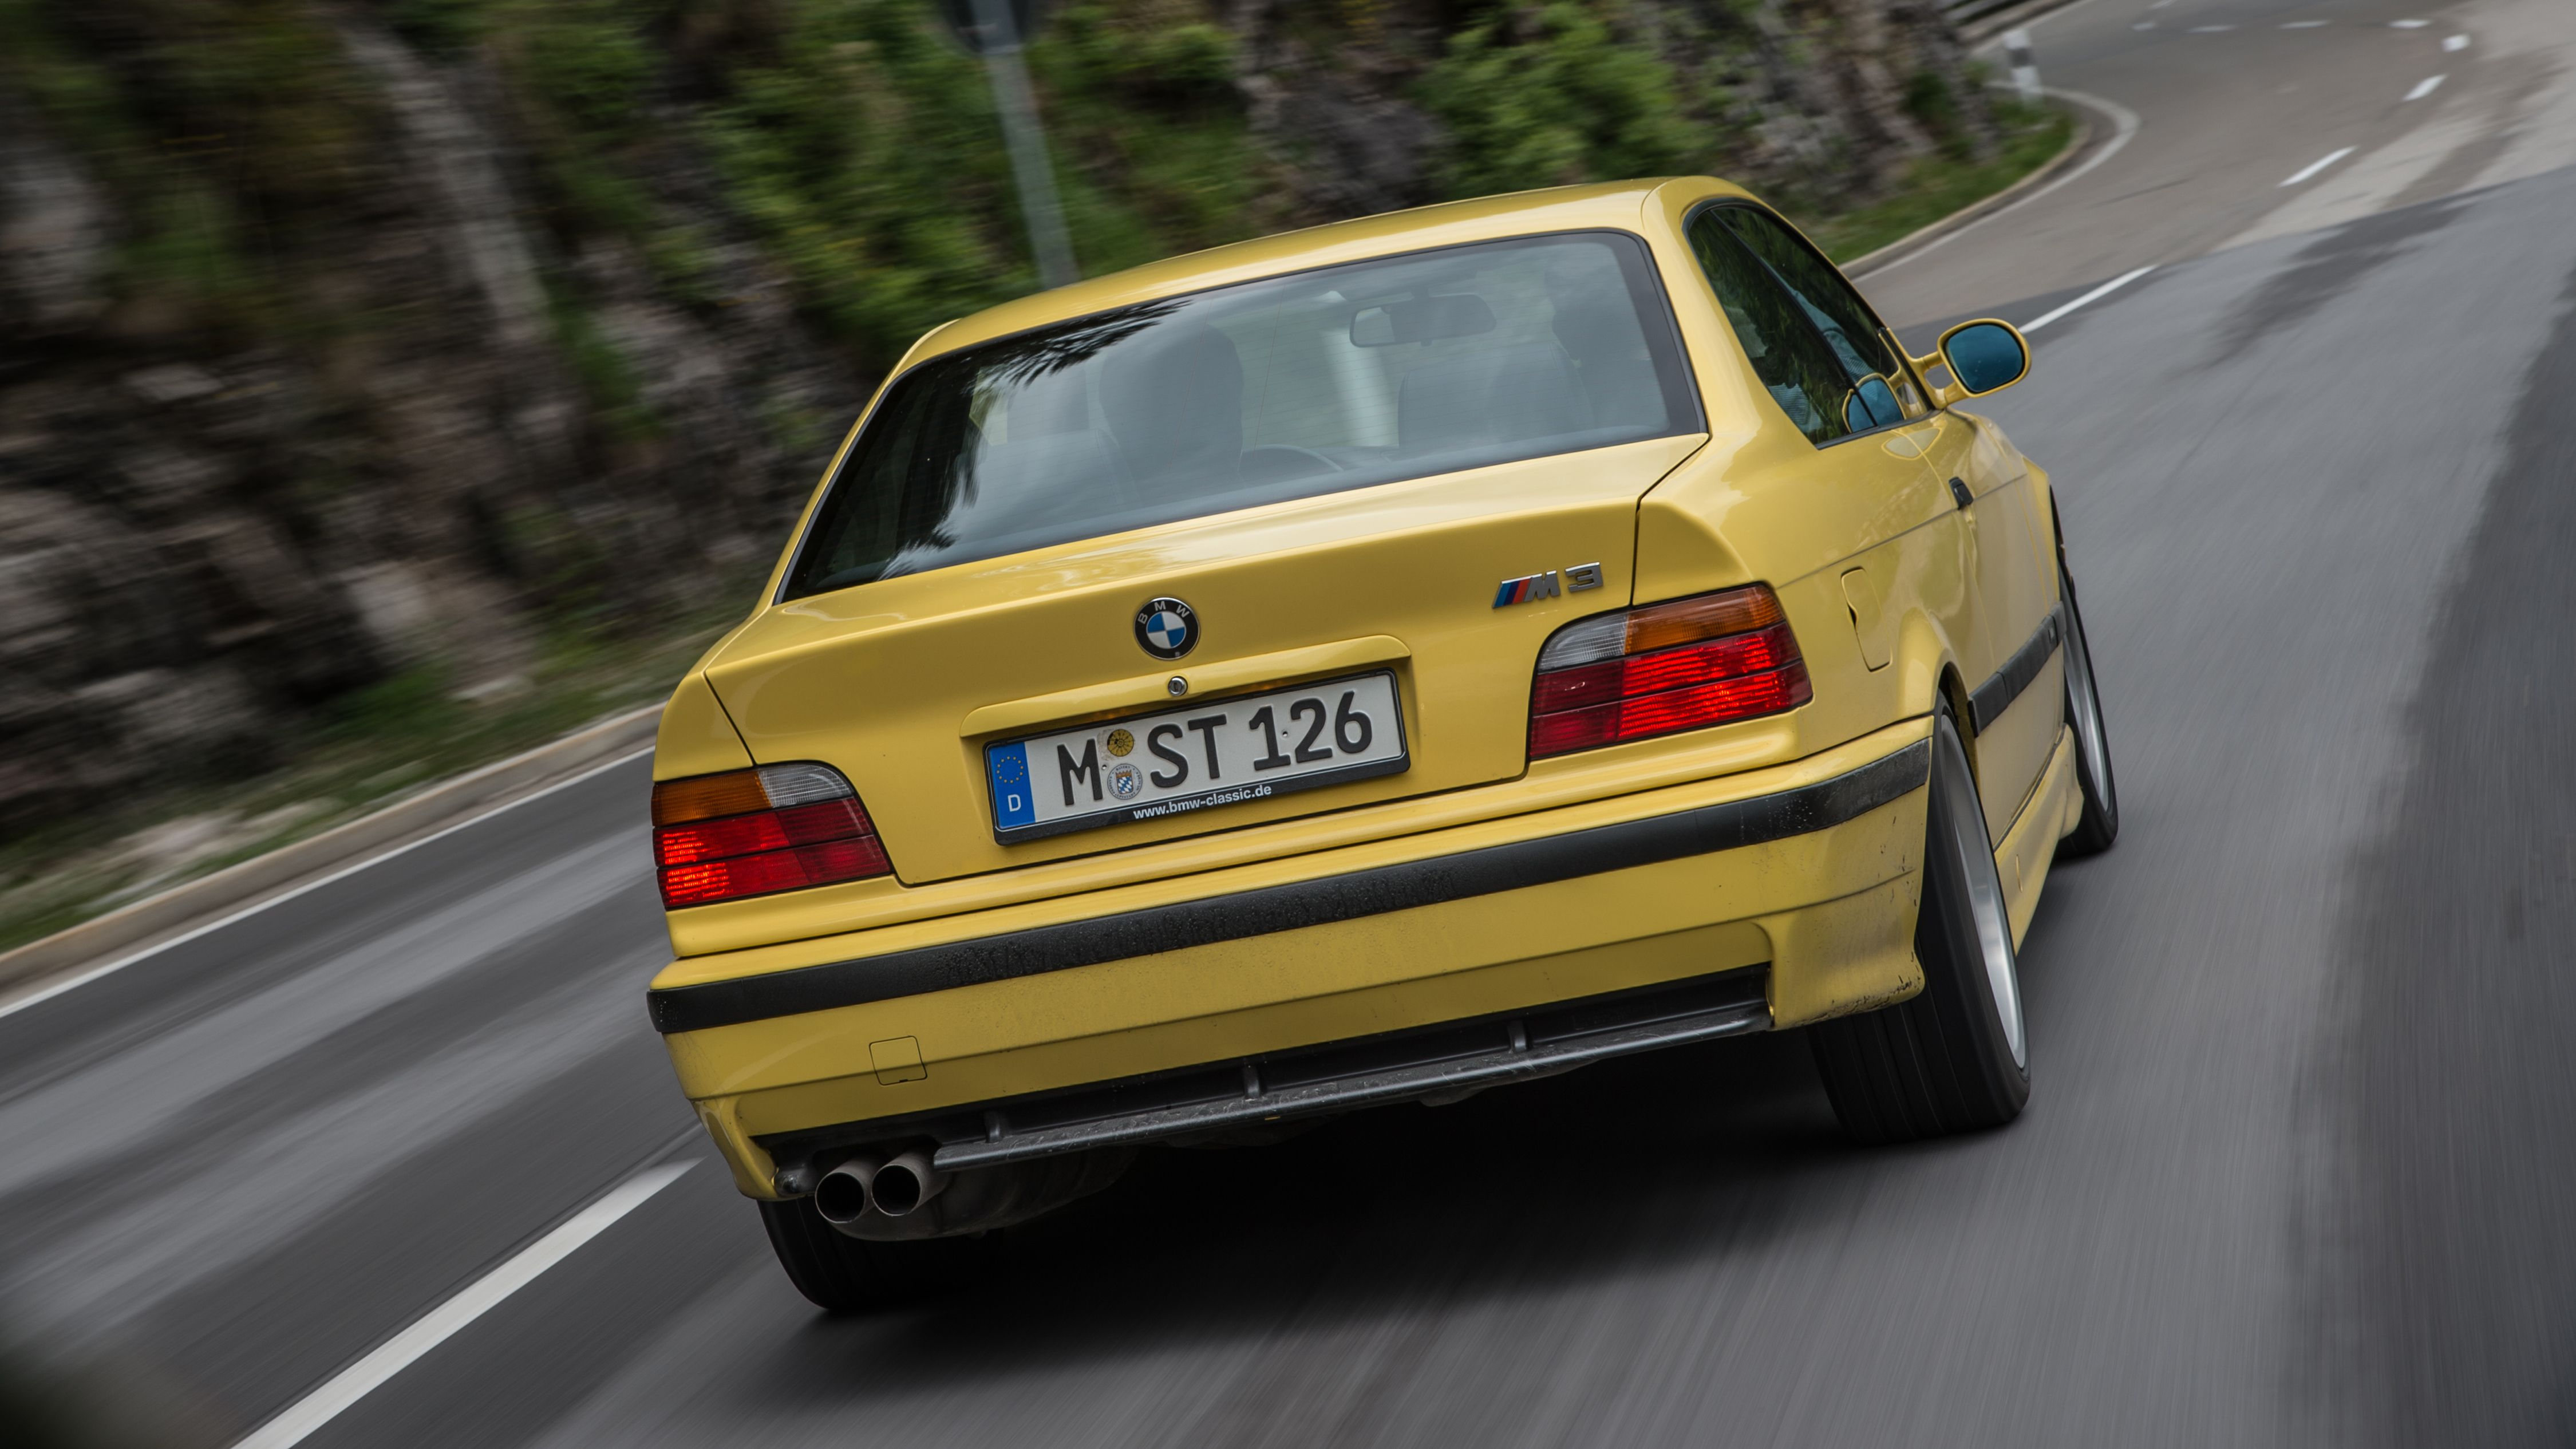 BMW M3 Coupe (E36) 1992 | BMW | Pinterest | Bmw m3 coupe, M3 coupe ...